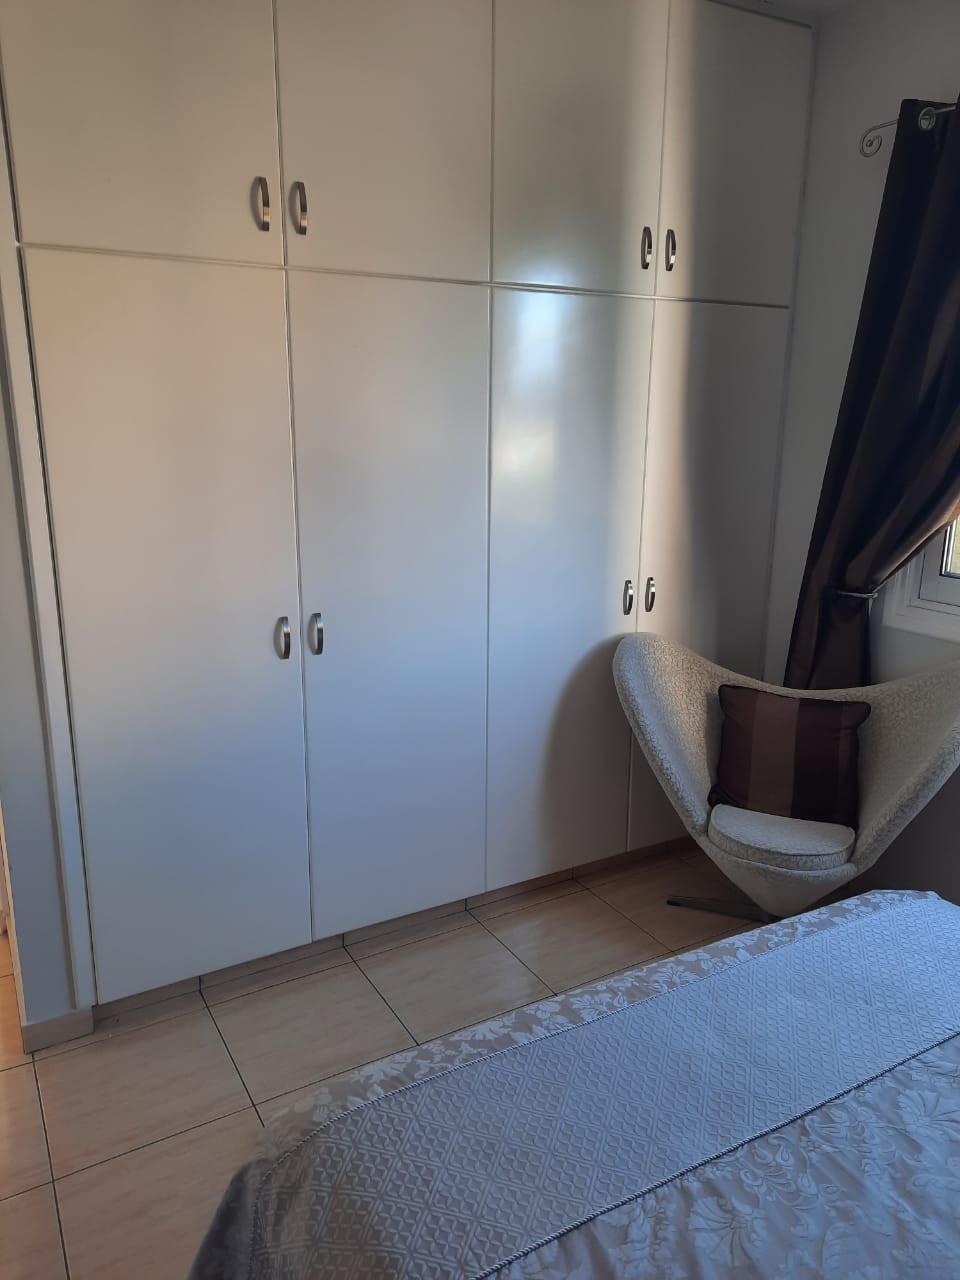 FC-33497: Apartment (Flat) in Mackenzie, Larnaca for Sale - #11